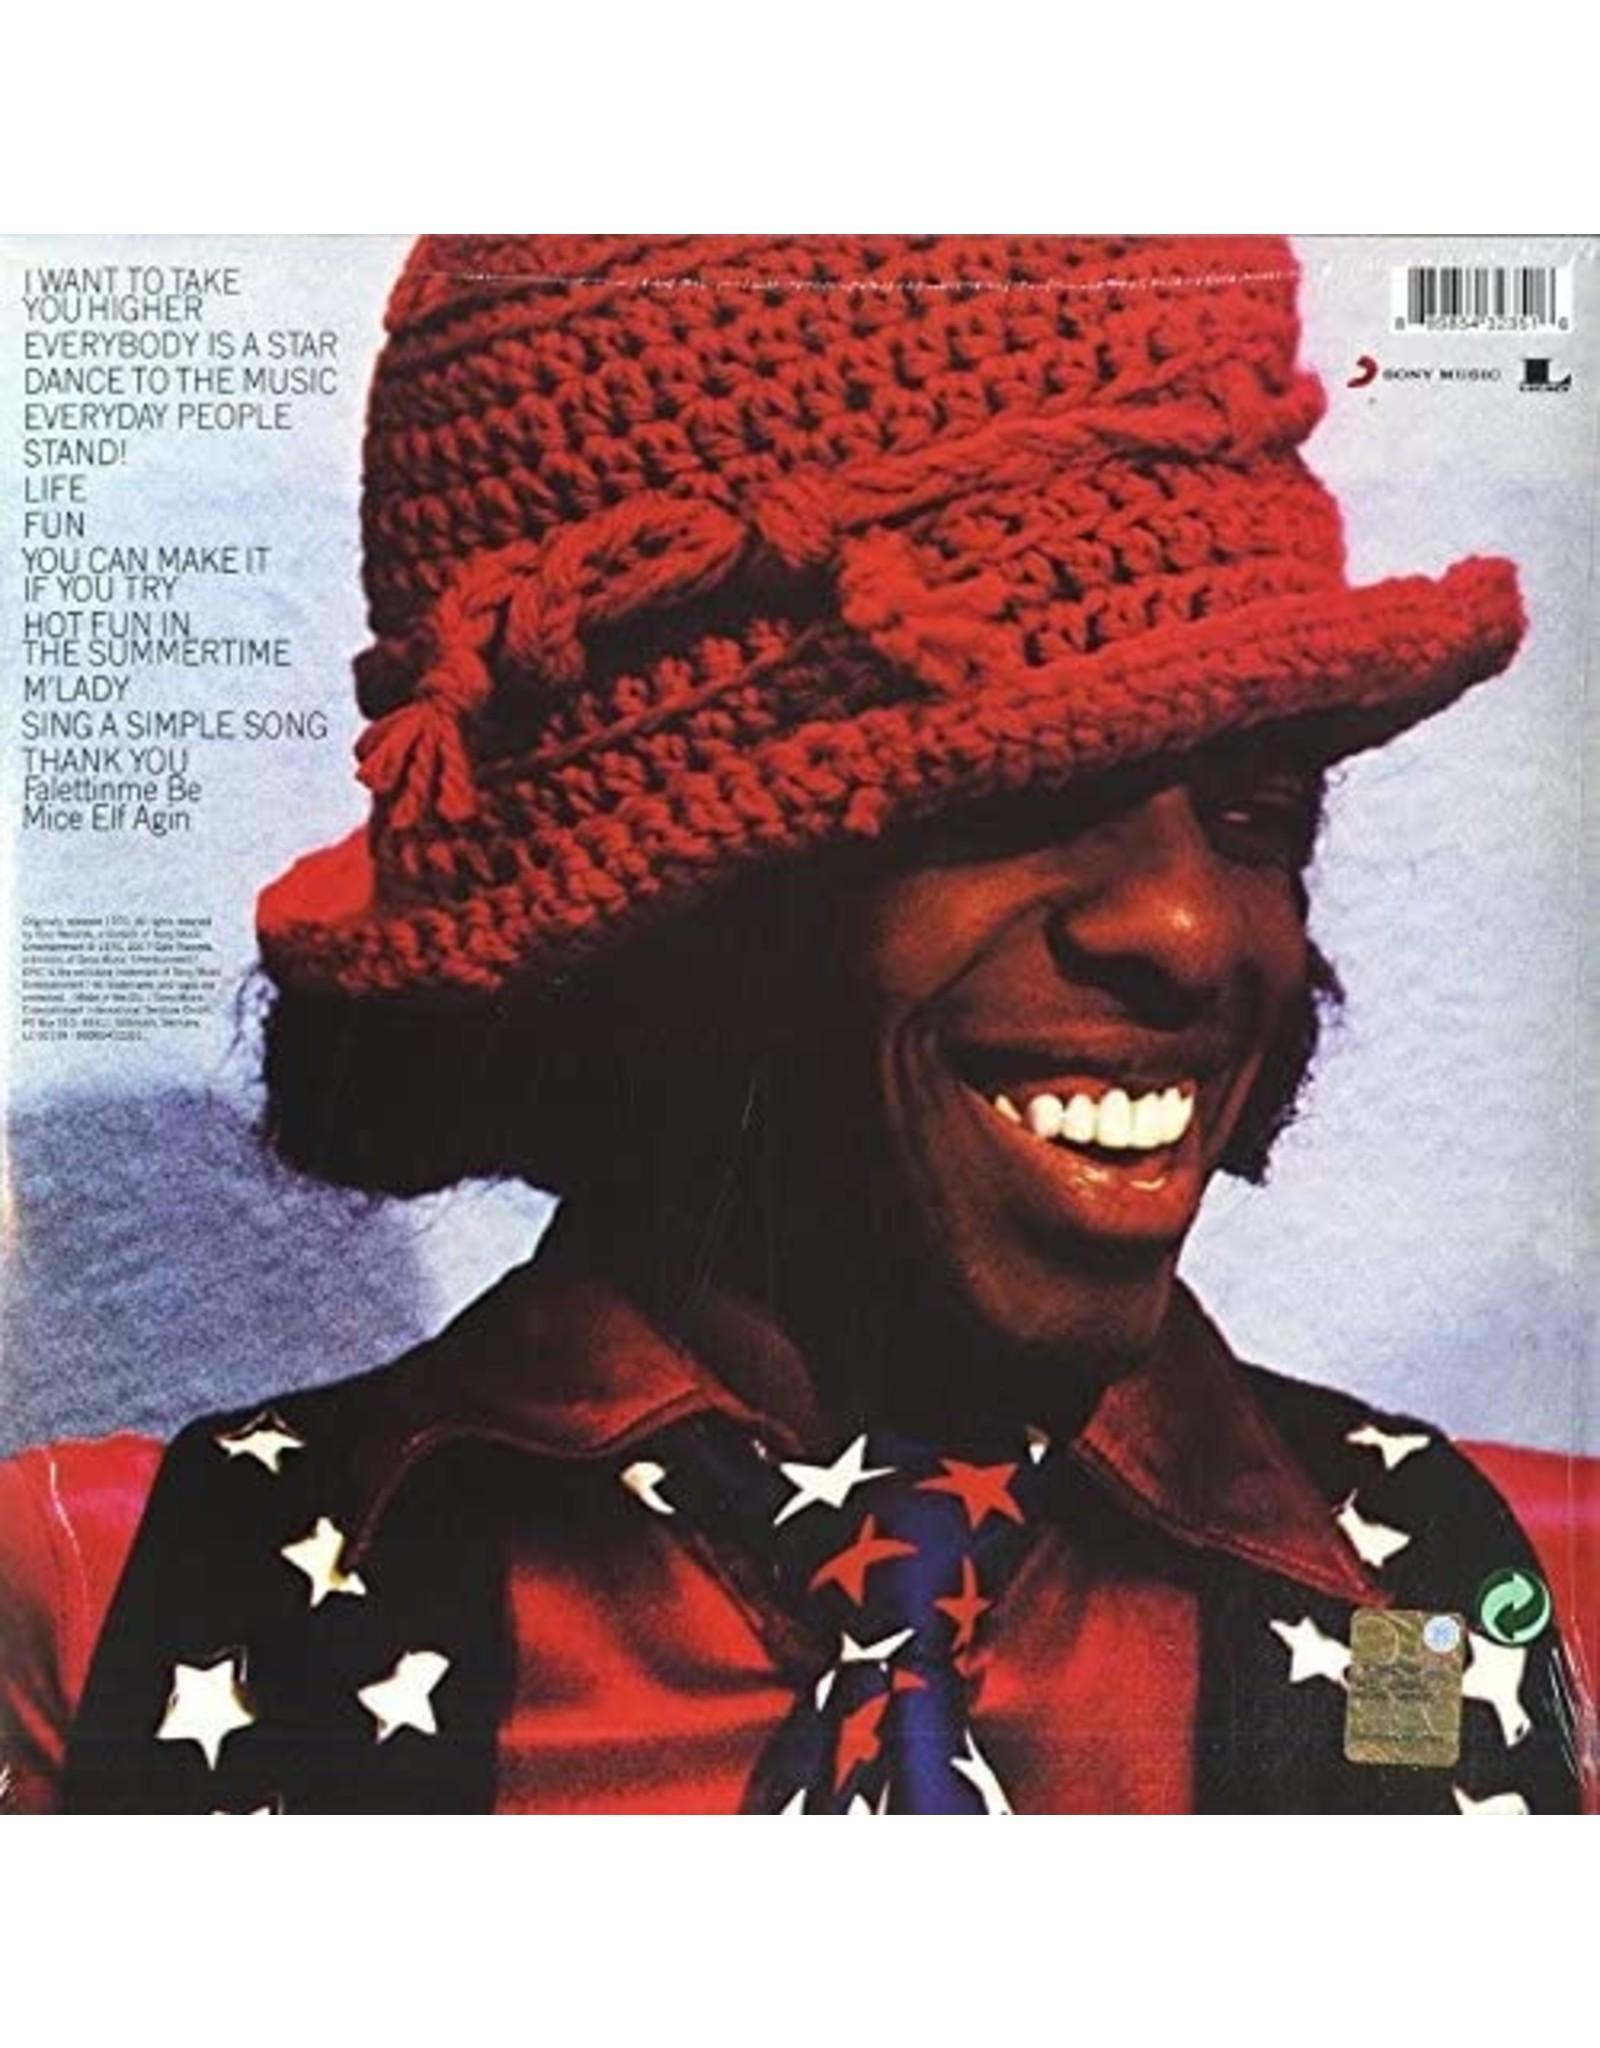 Sly & The Family Stone - Greatest Hits